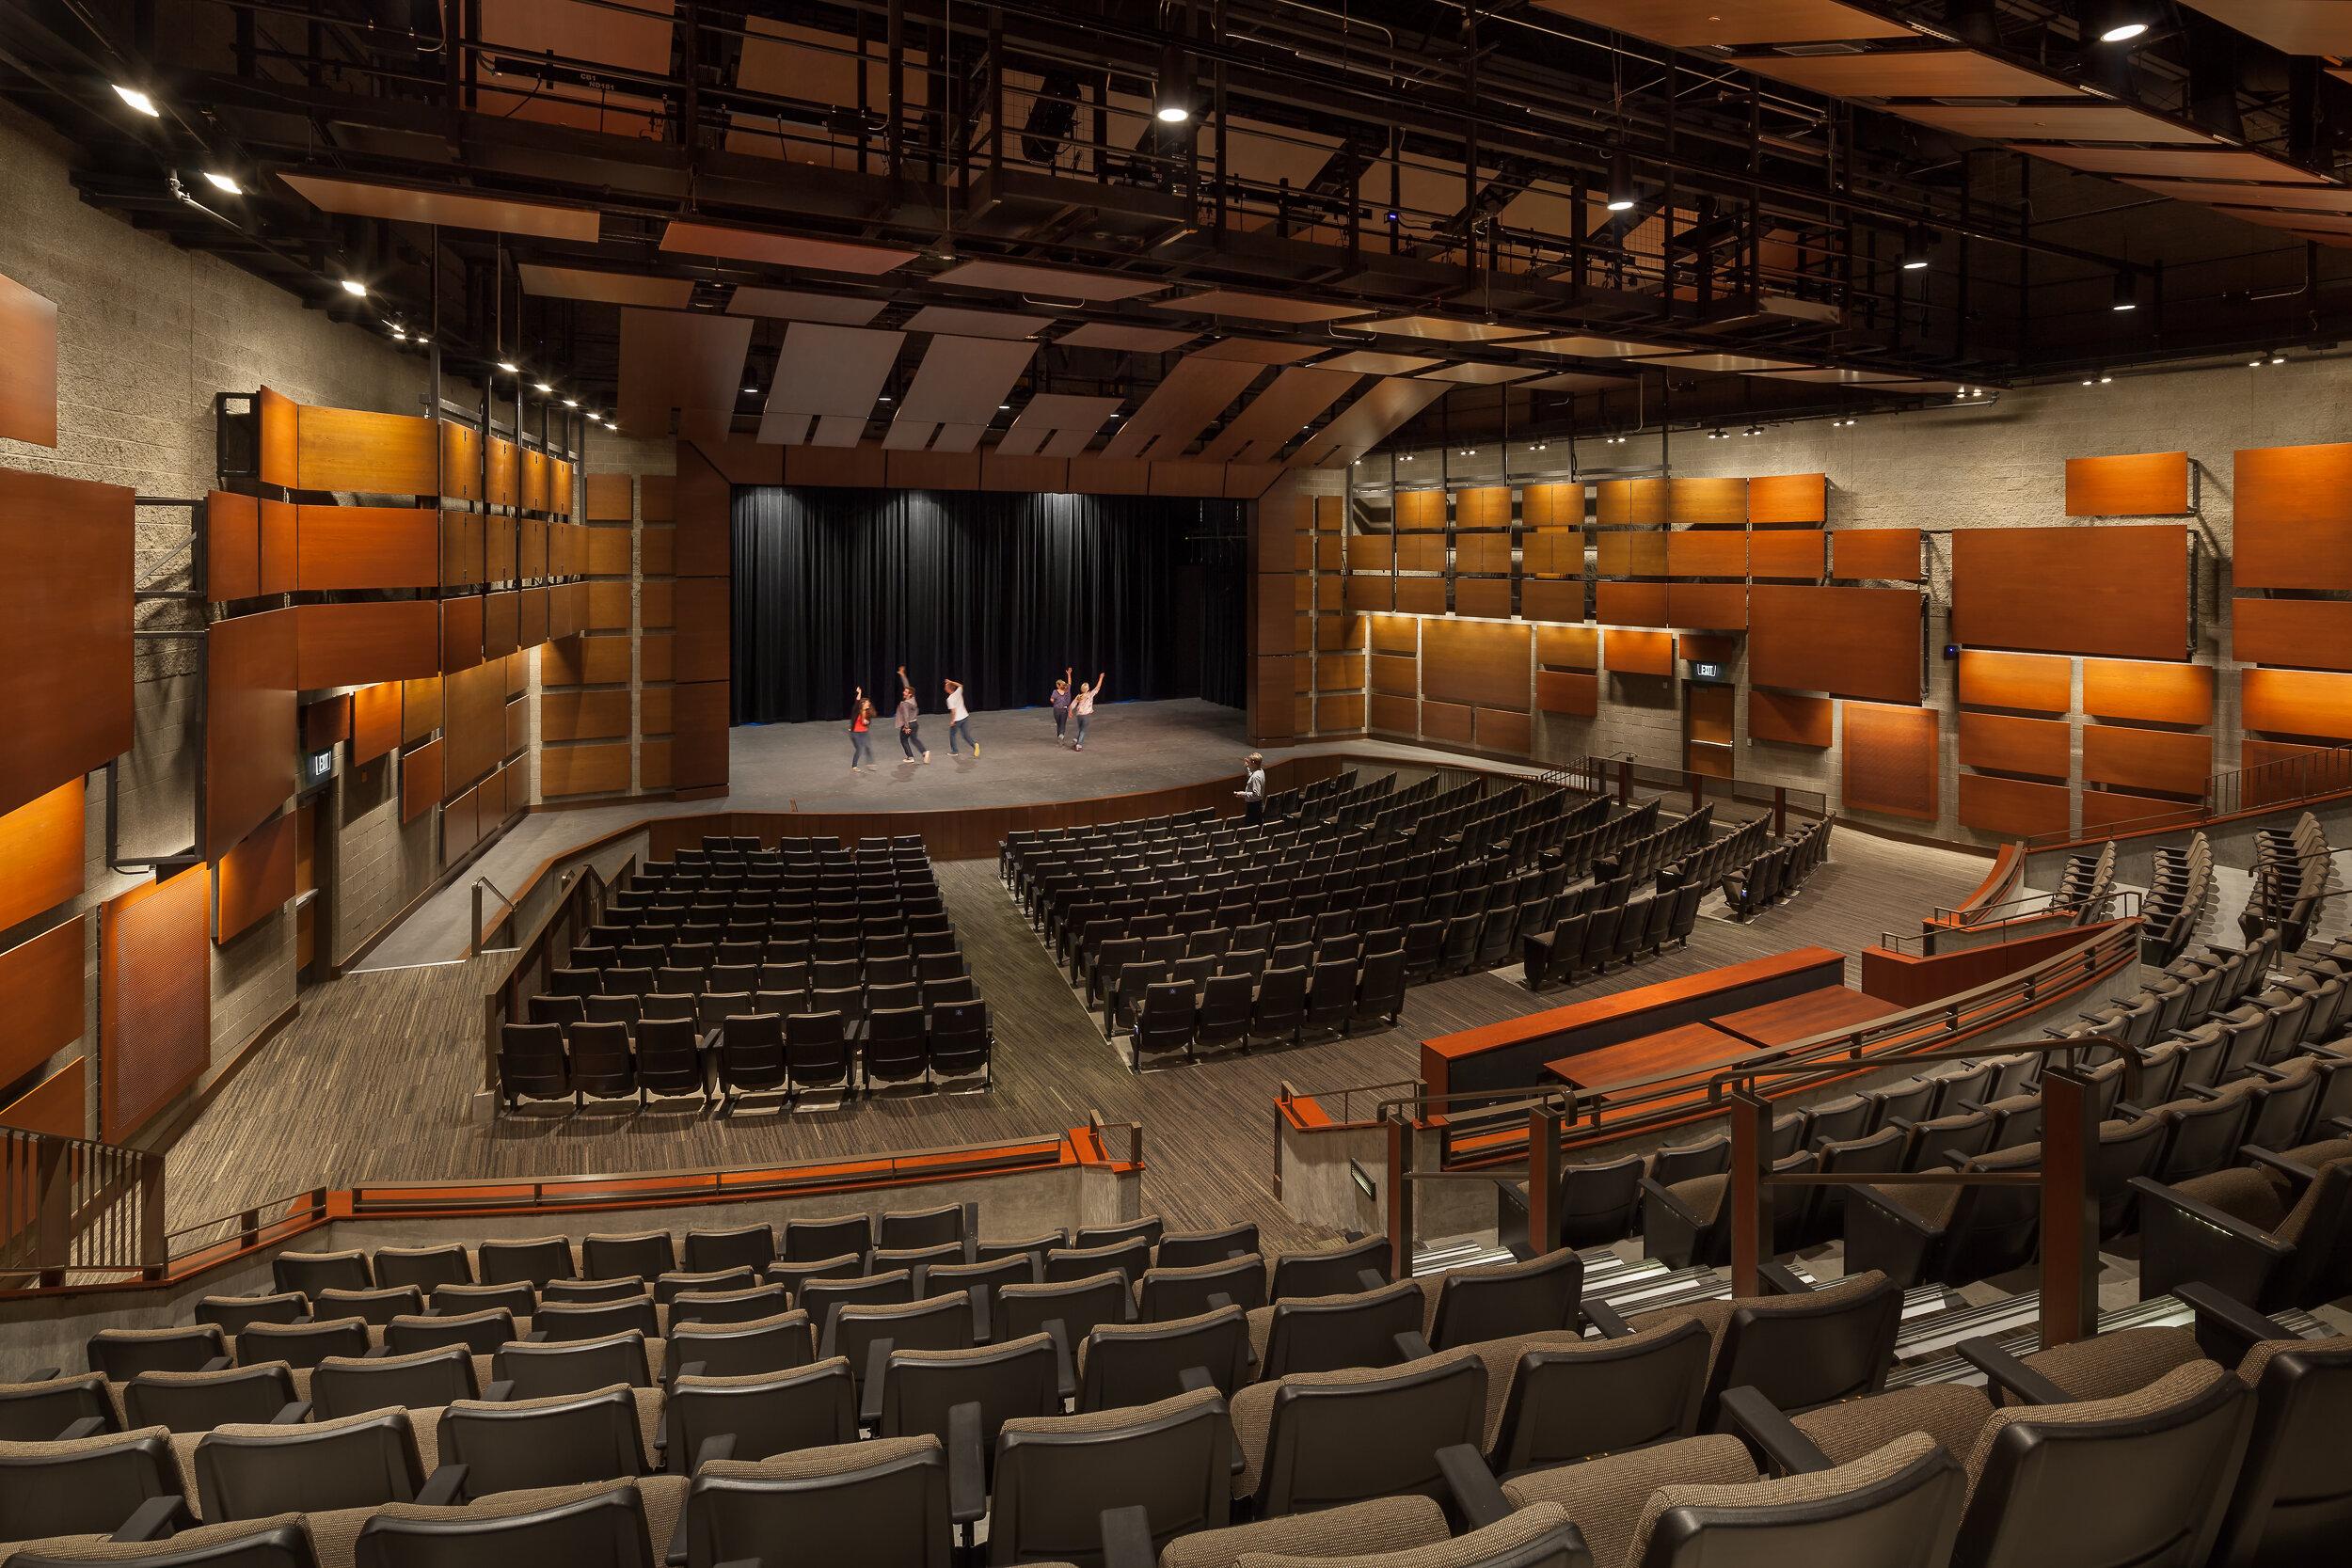 53-SandyHS-JoshPartee-3300-auditorium.jpg